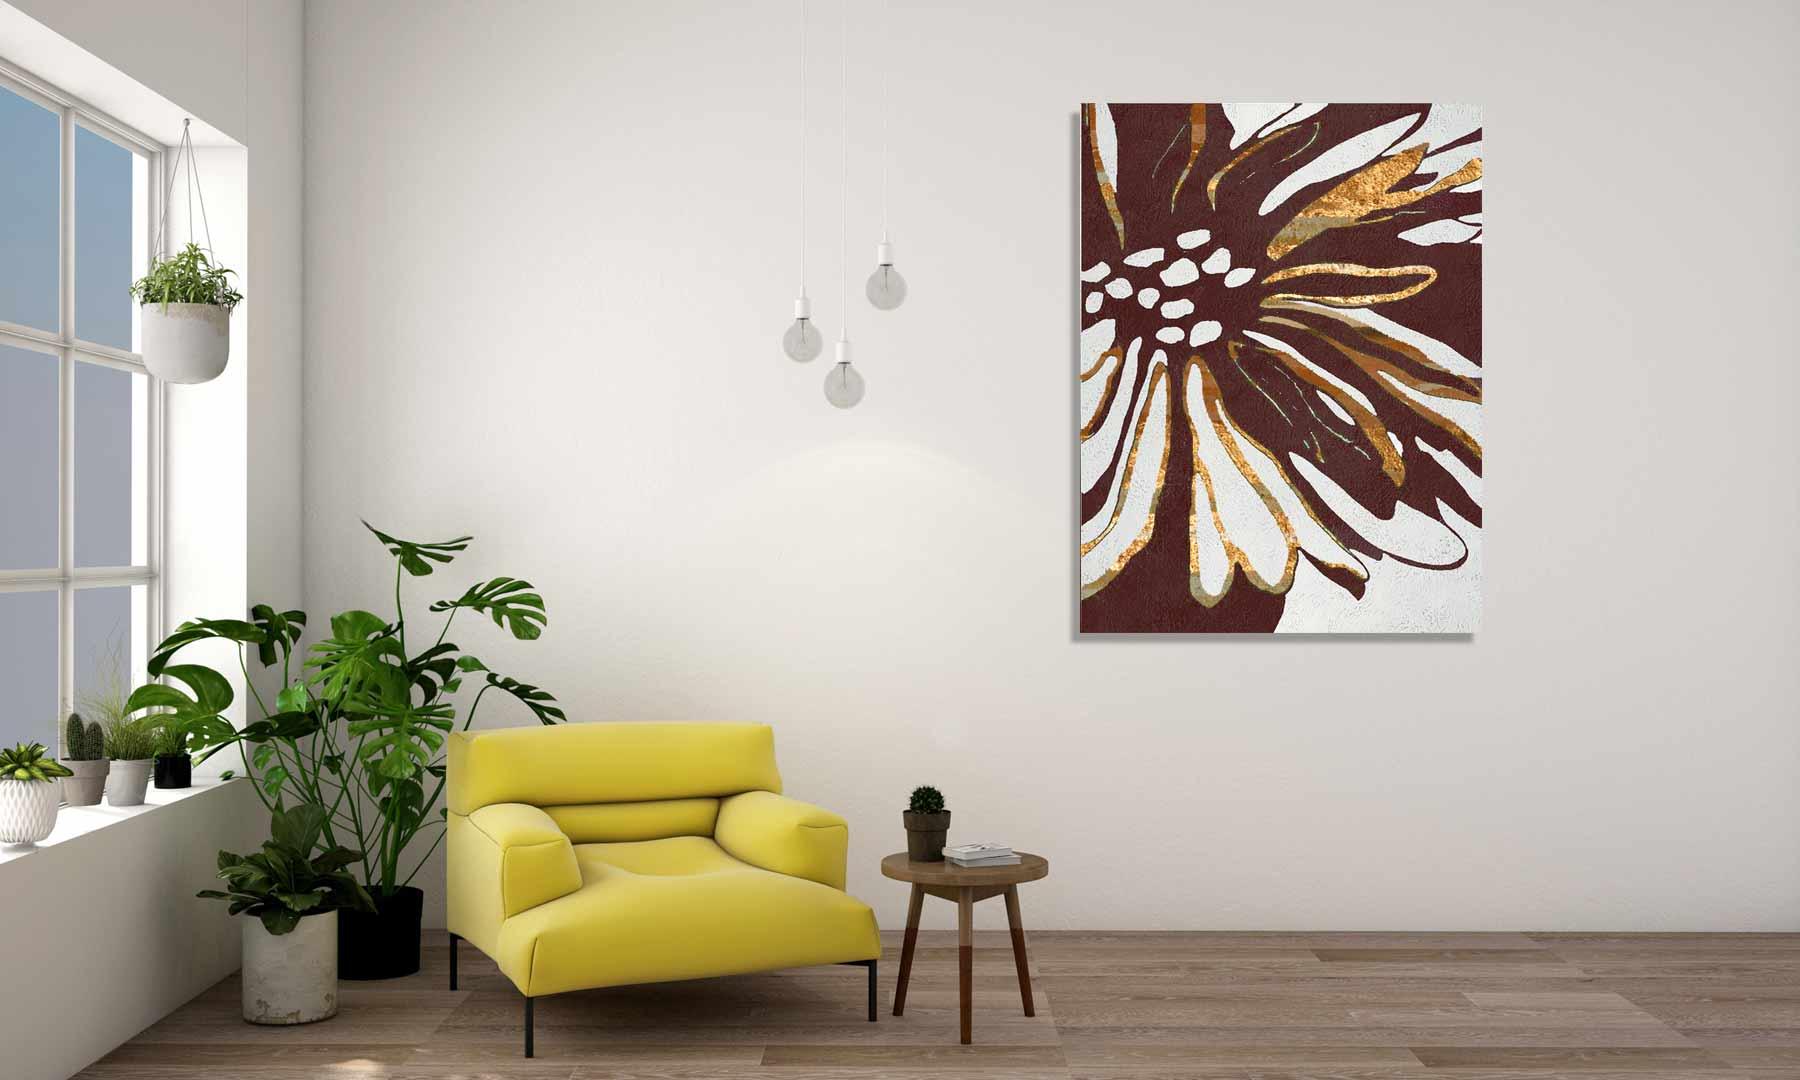 designerflower cool floral decoration for the wall rh mariamoretti com